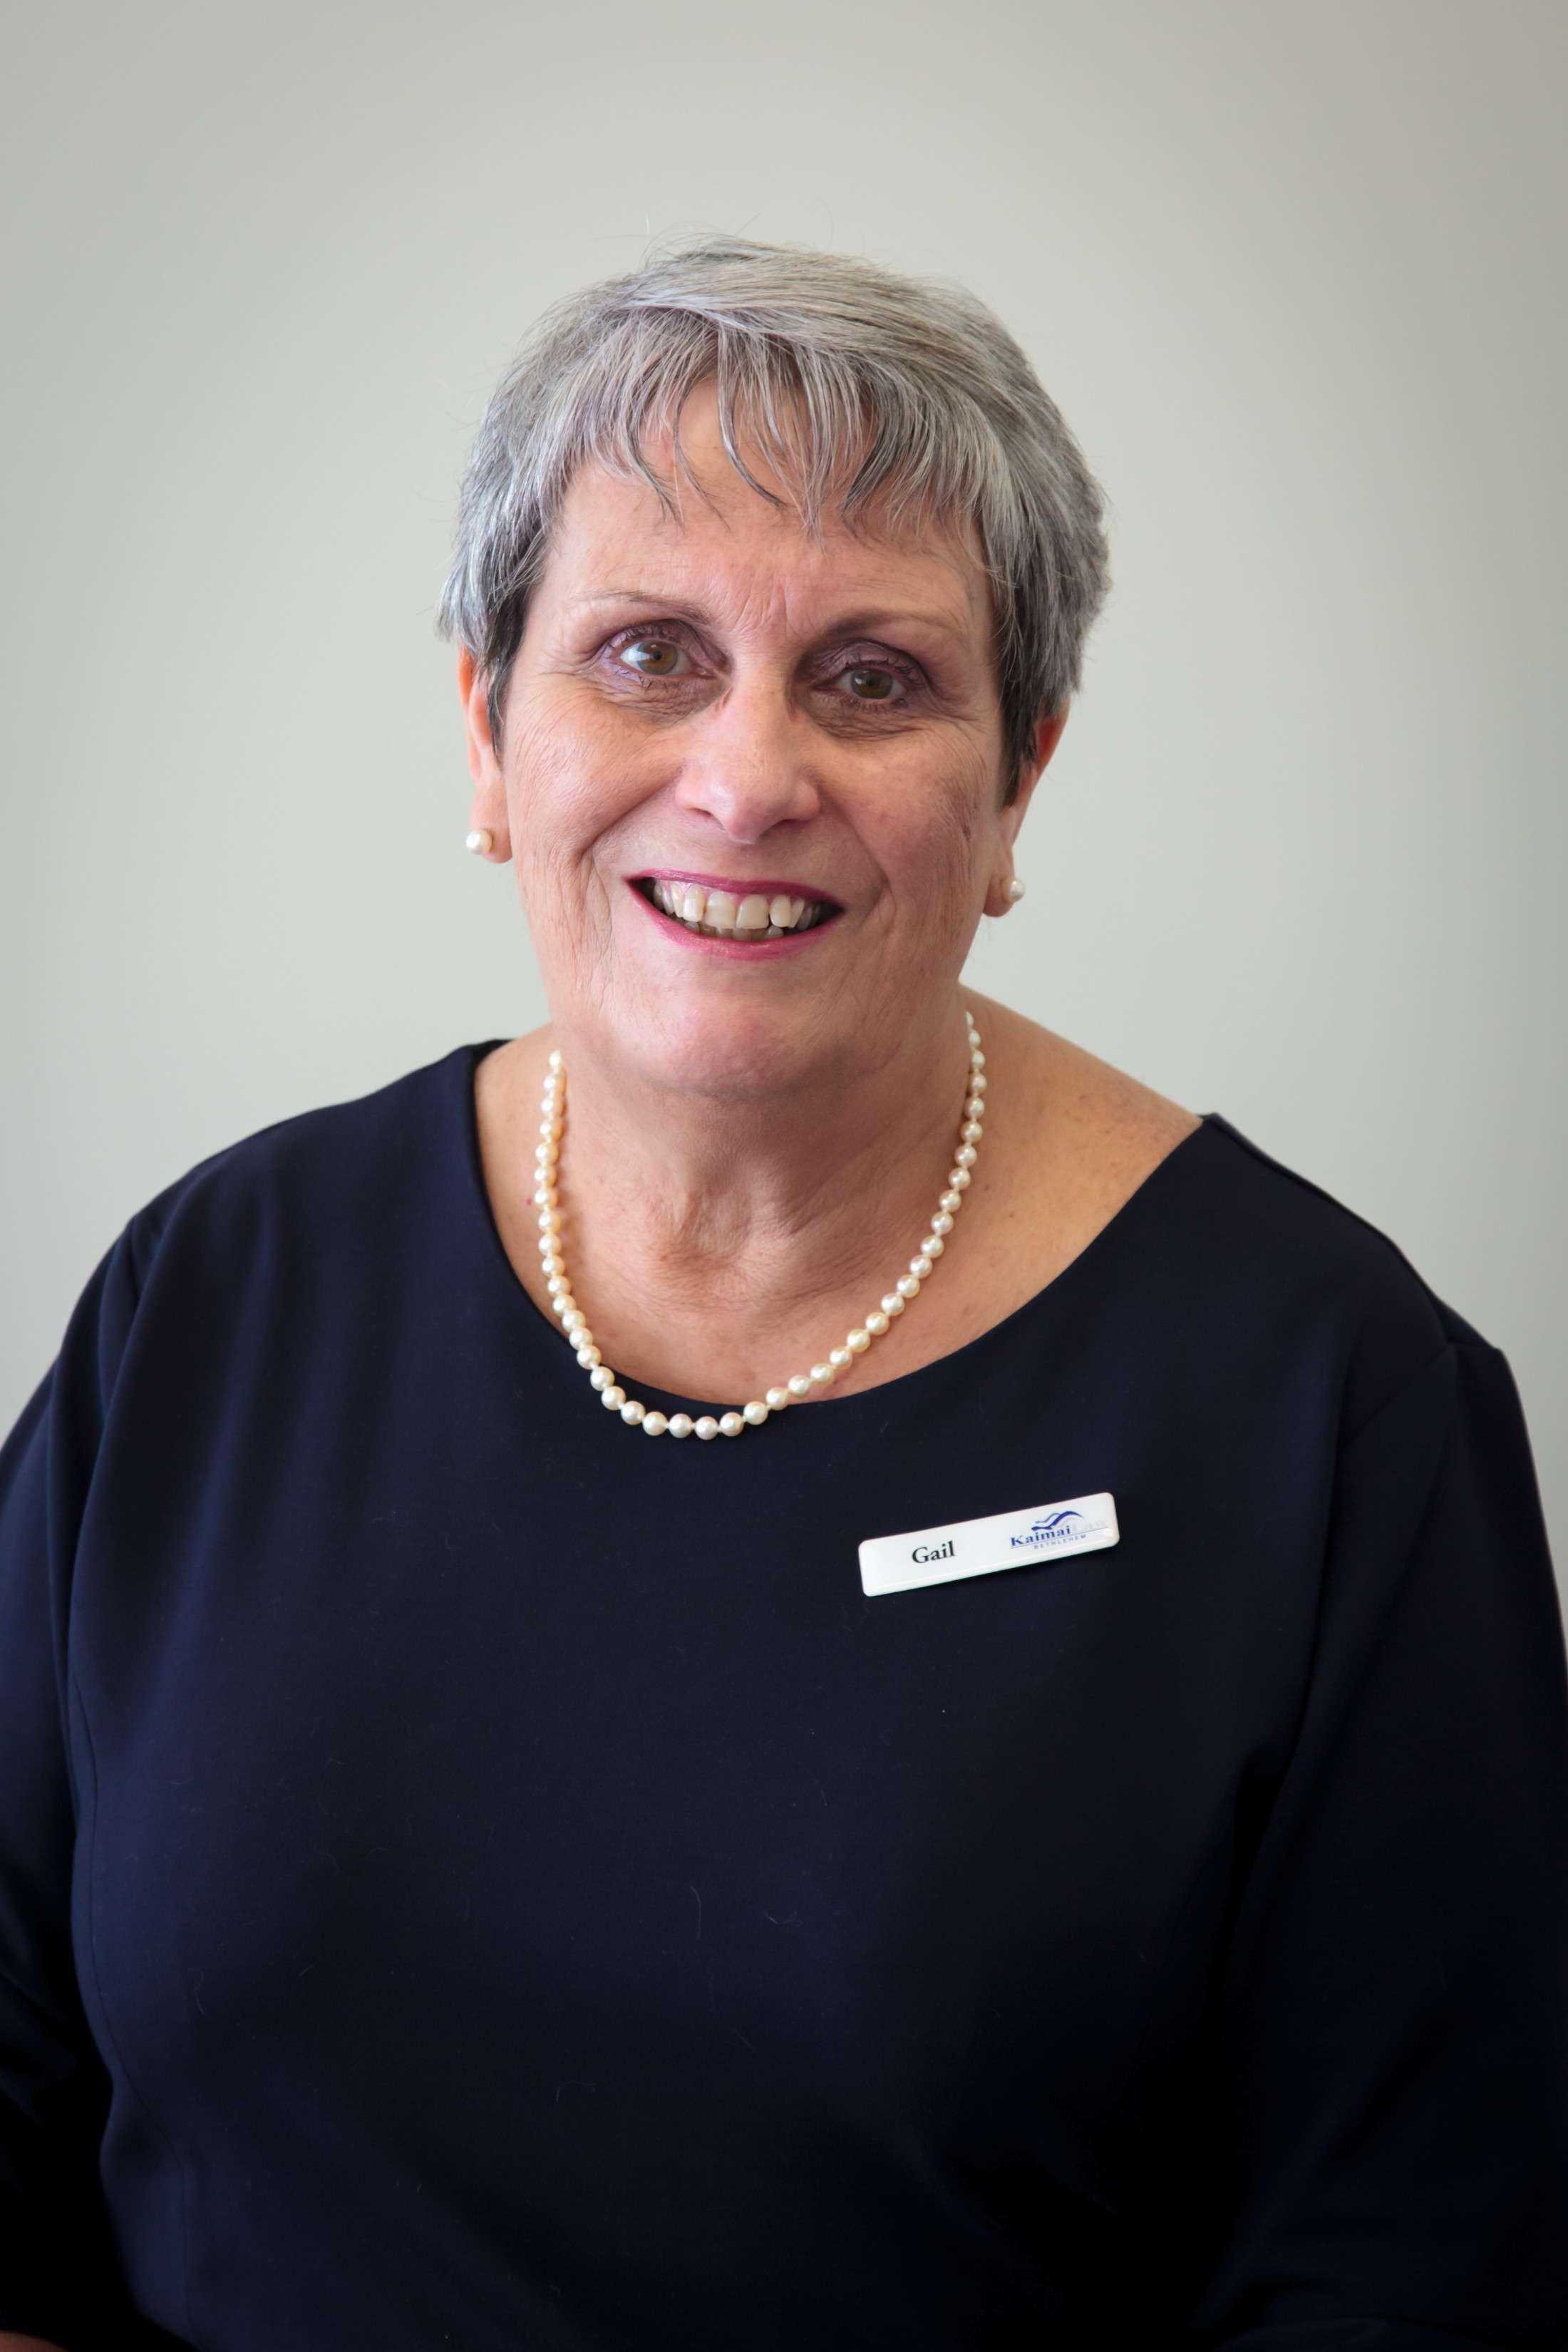 Gail Haydock